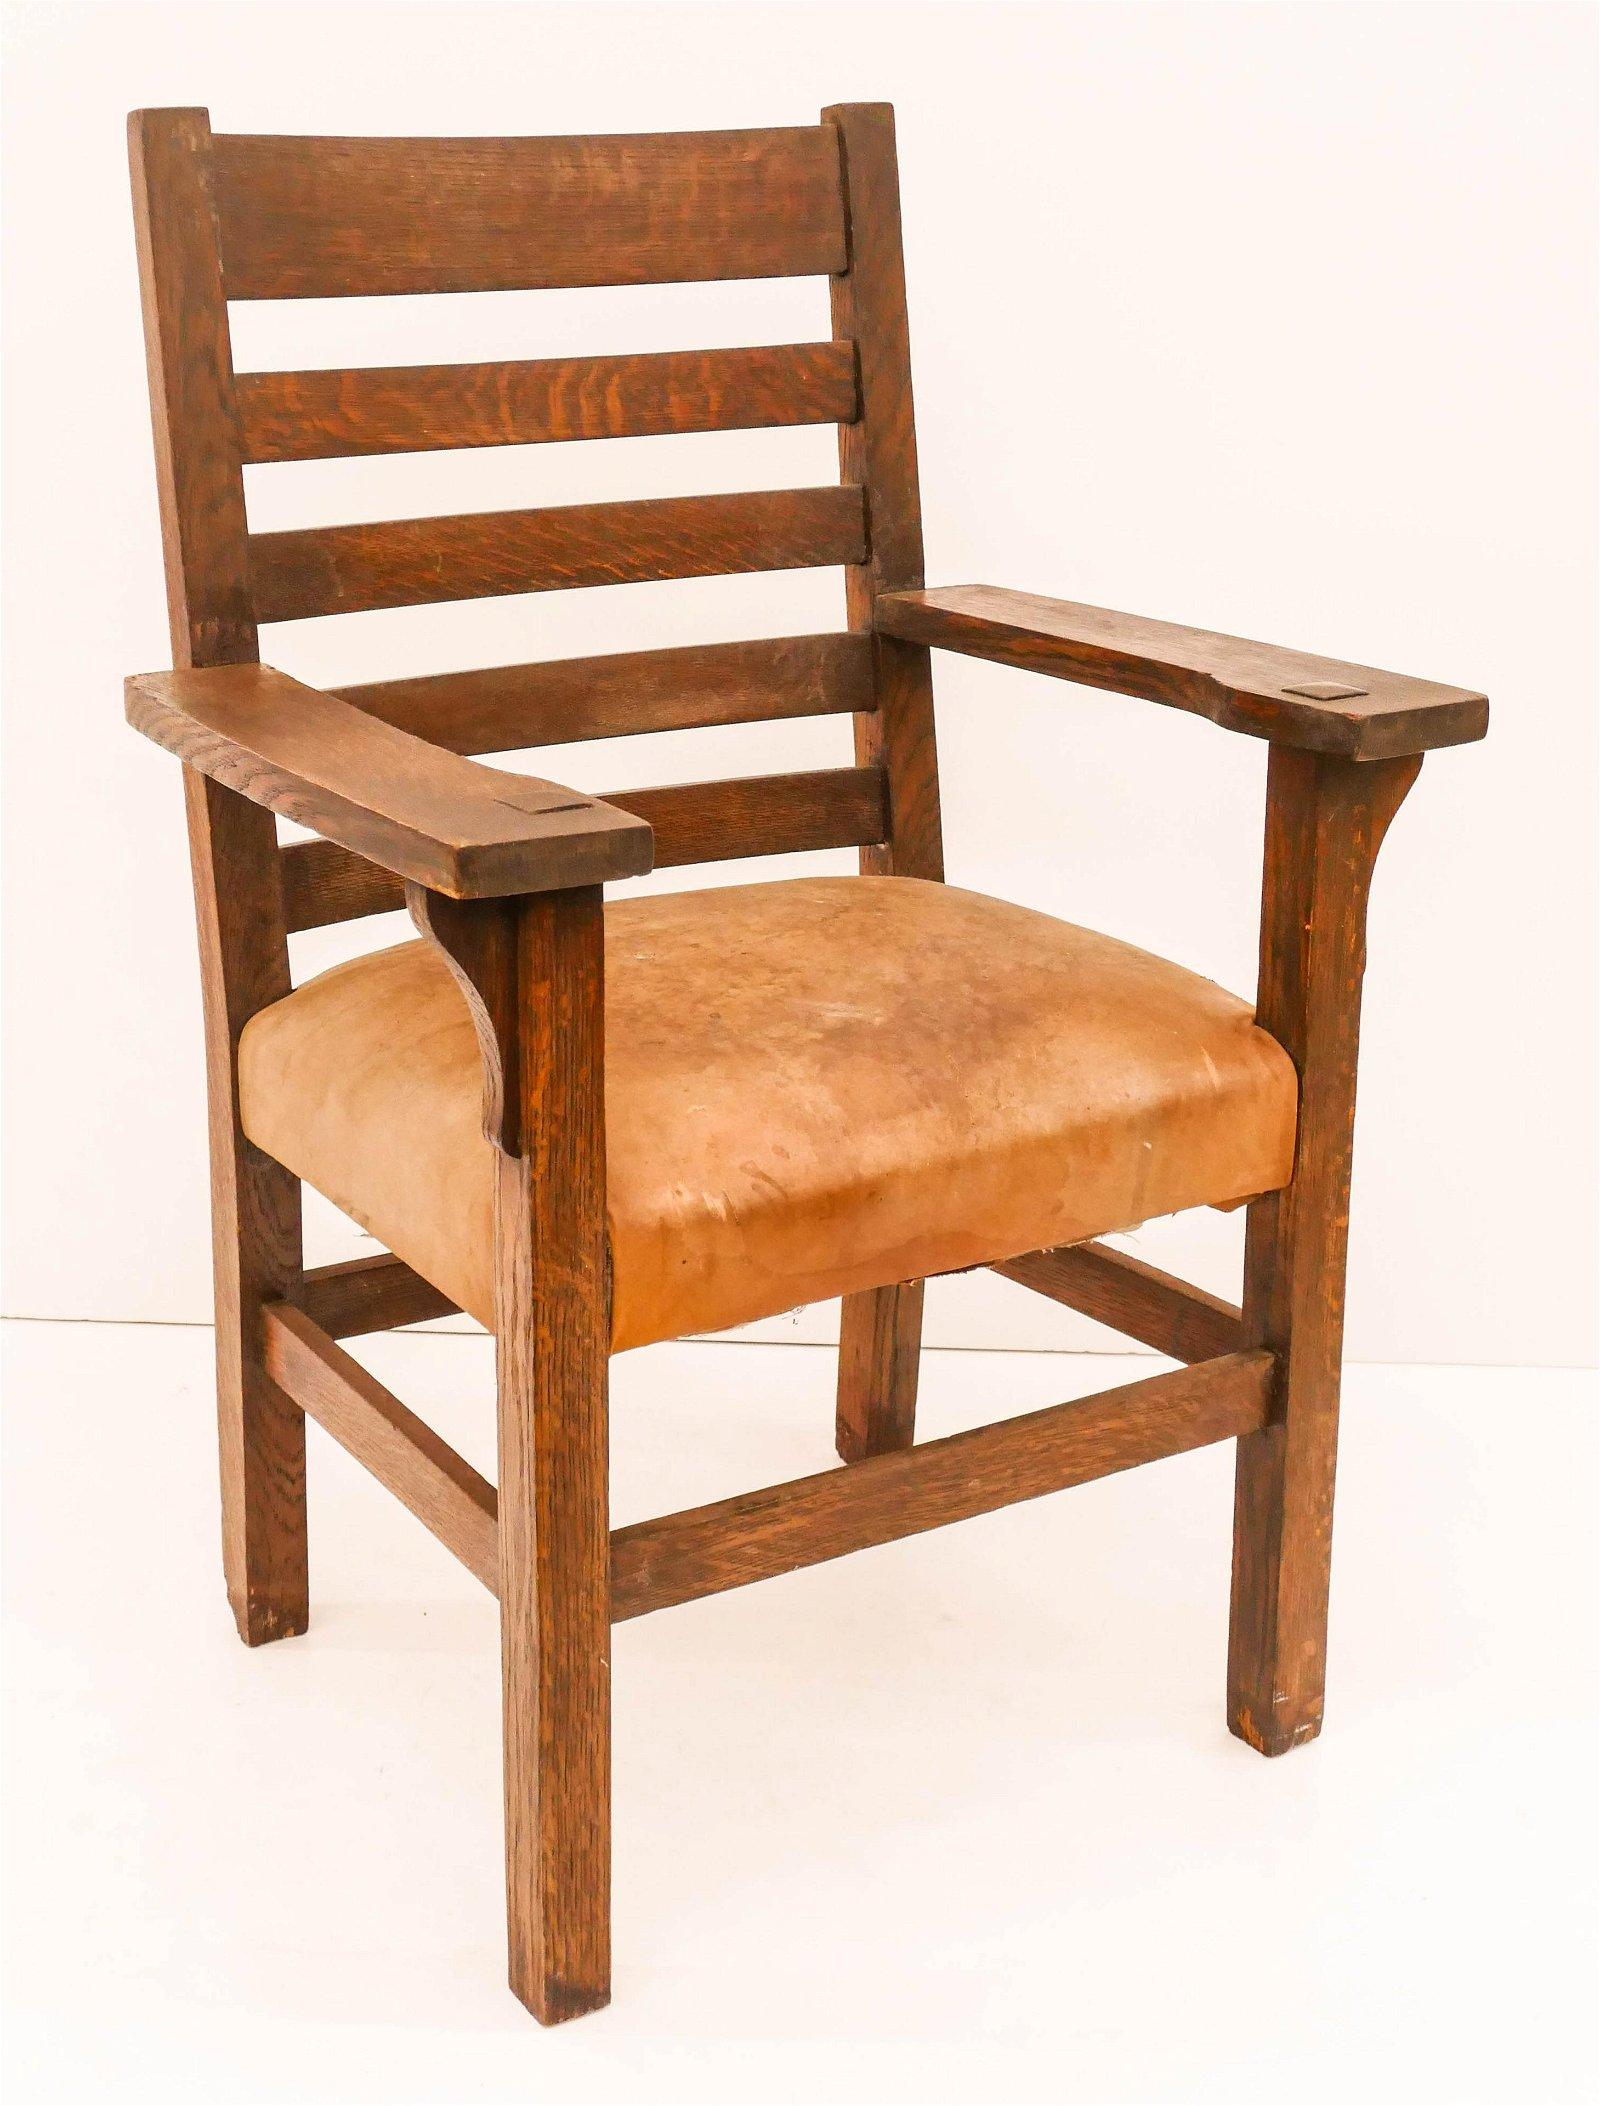 J.M. Young Arts & Crafts Oak Armchair 39''x27''x21''. A